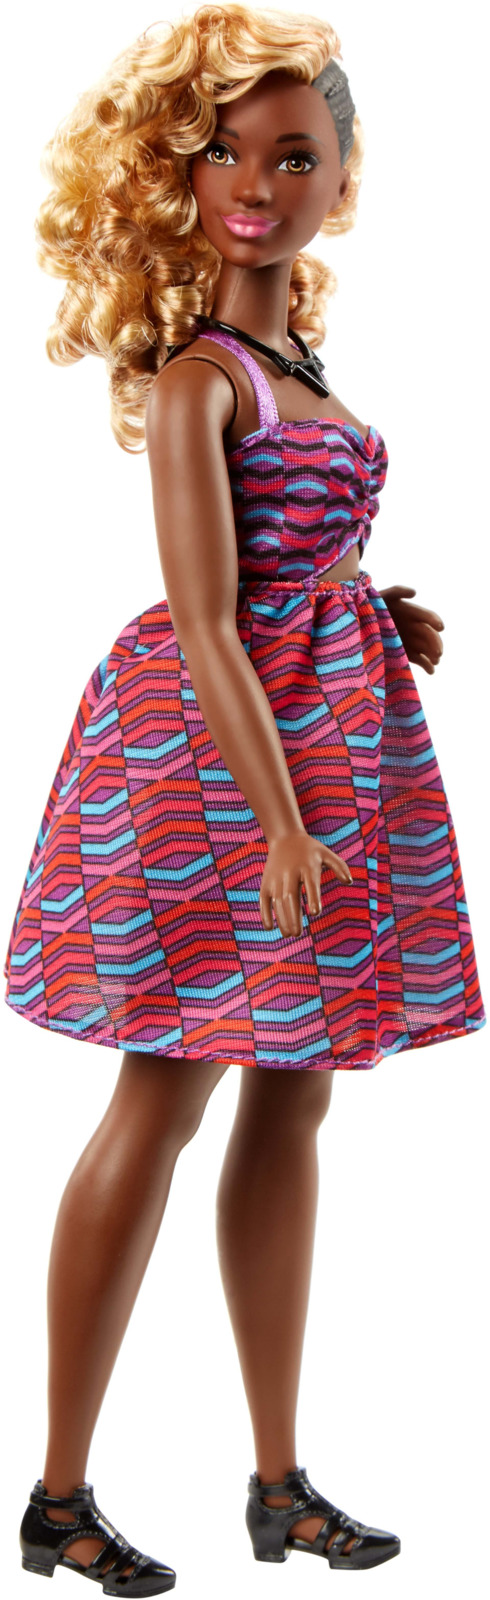 Кукла Barbie Fashionistas № 57 кукла barbie fashionistas 61